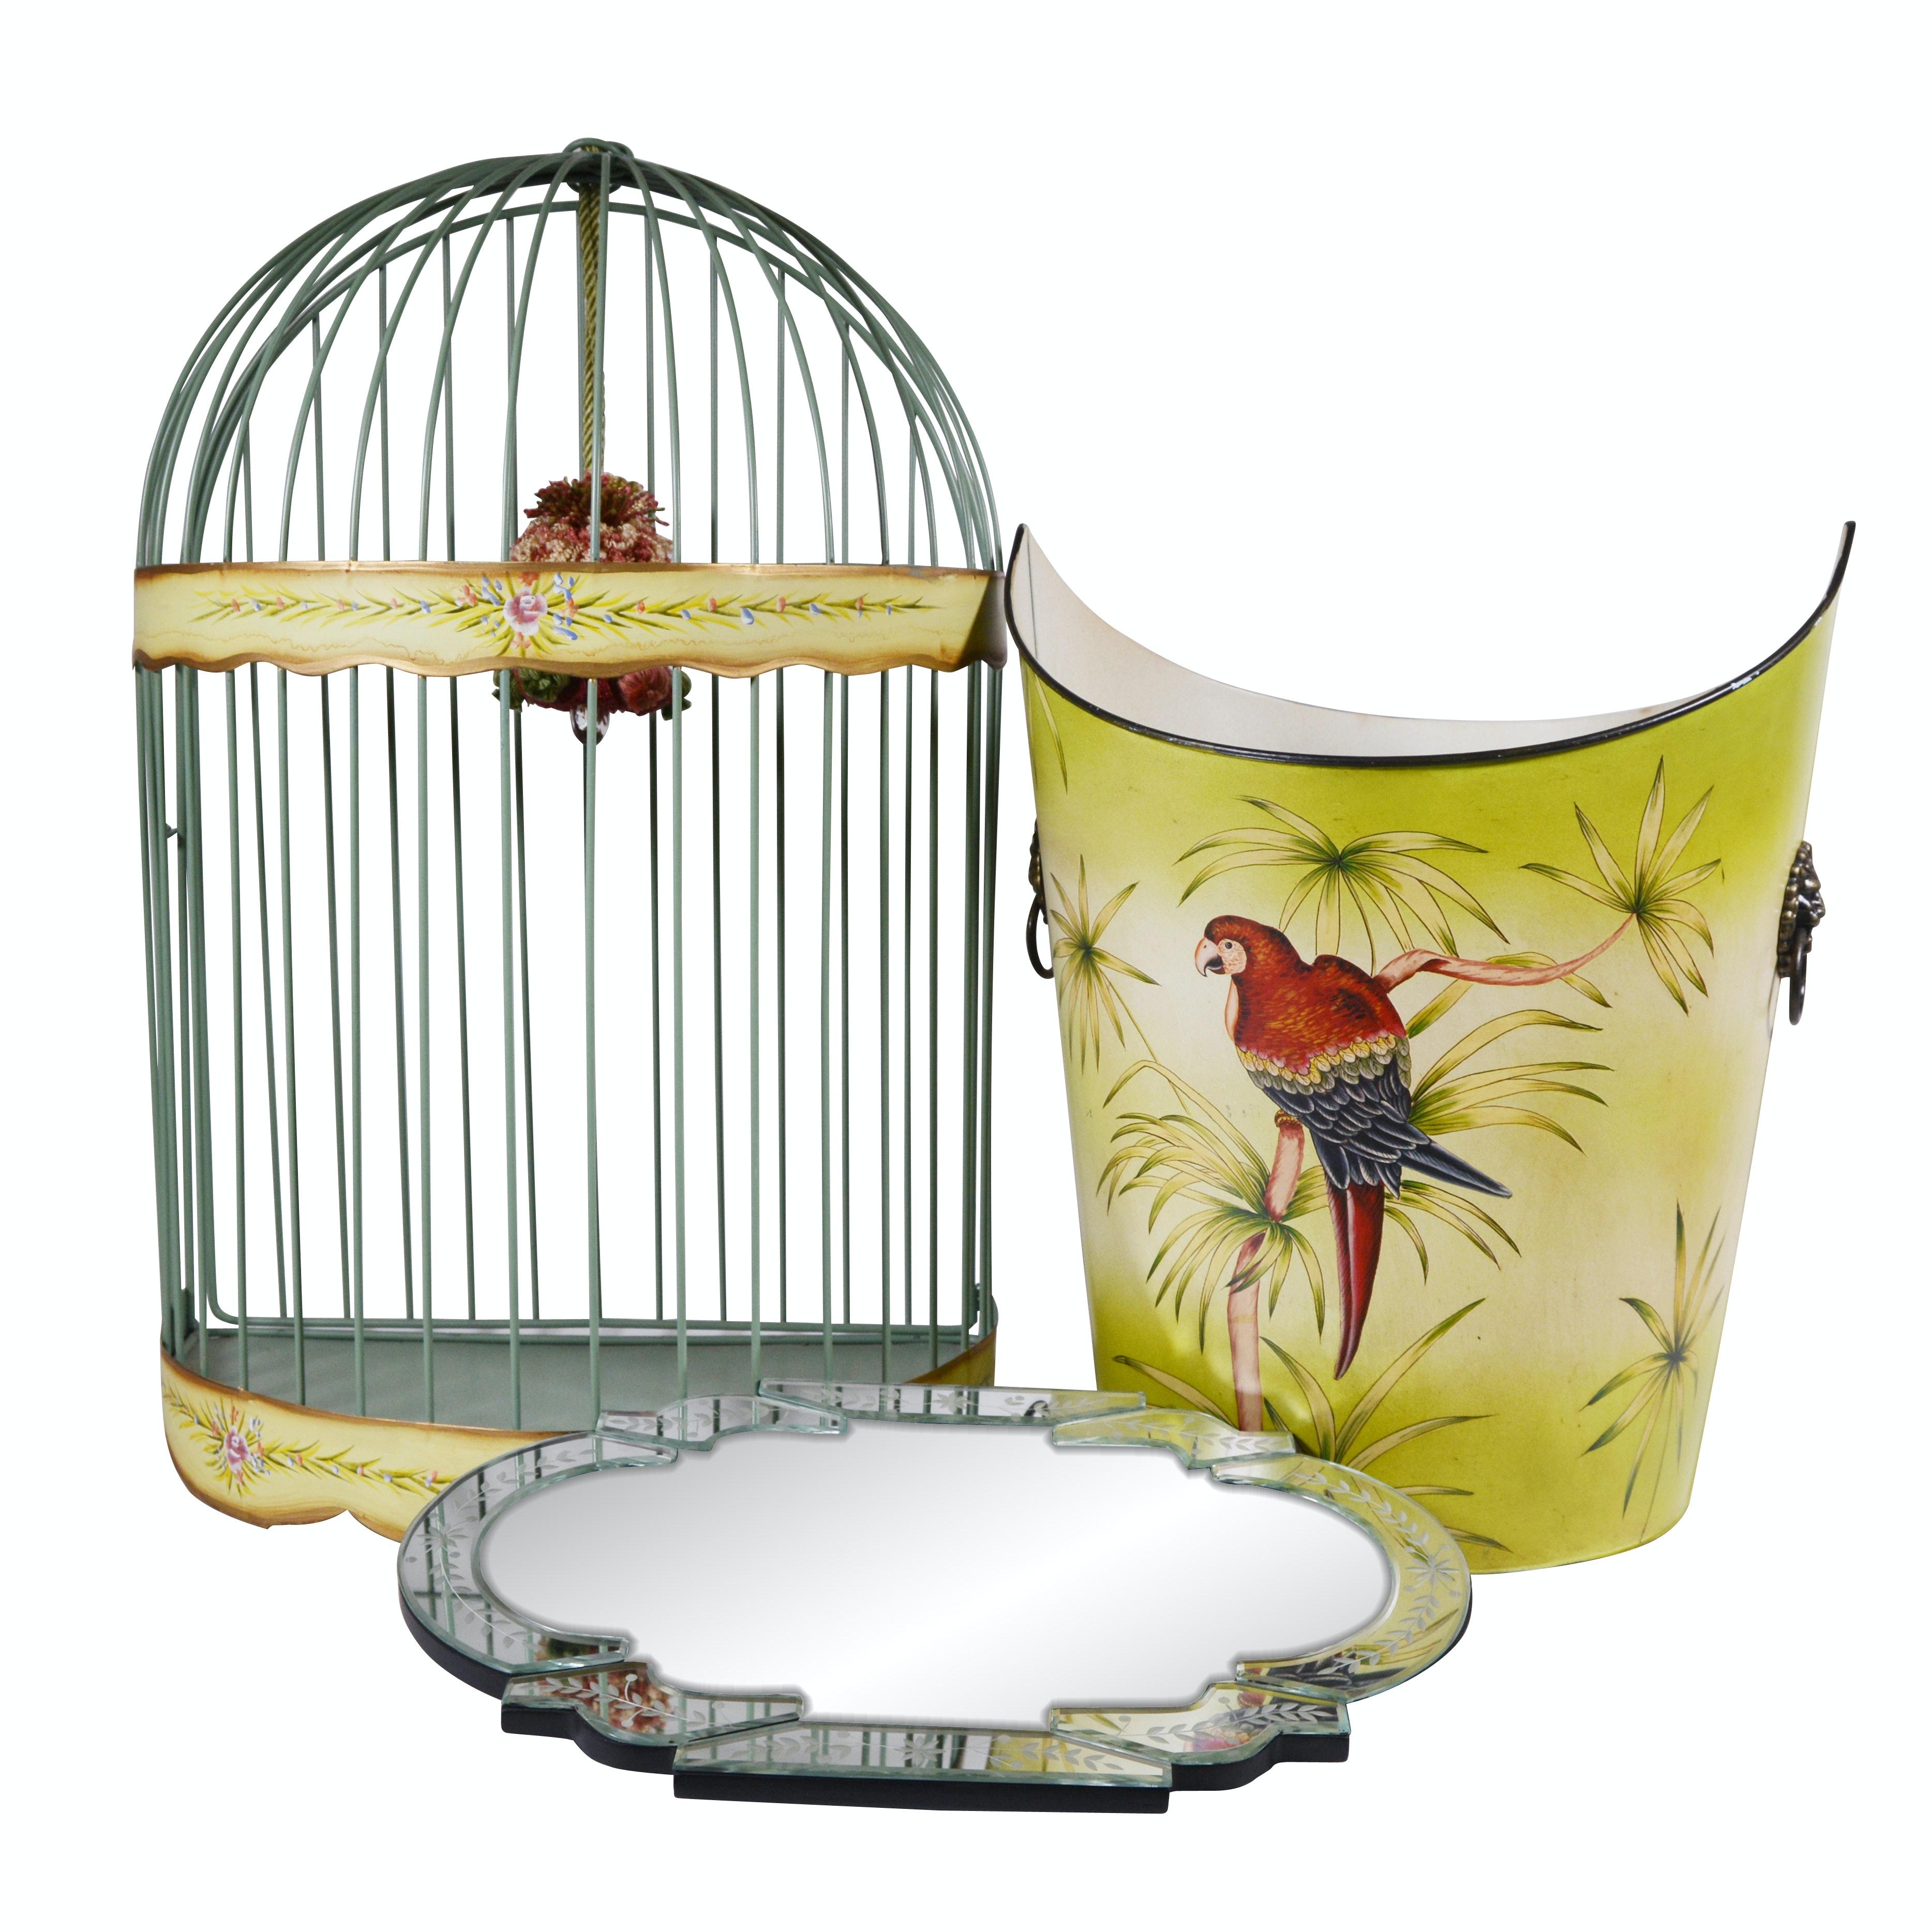 Metal Wastebasket, Birdcage and Mirrored Vanity Tray